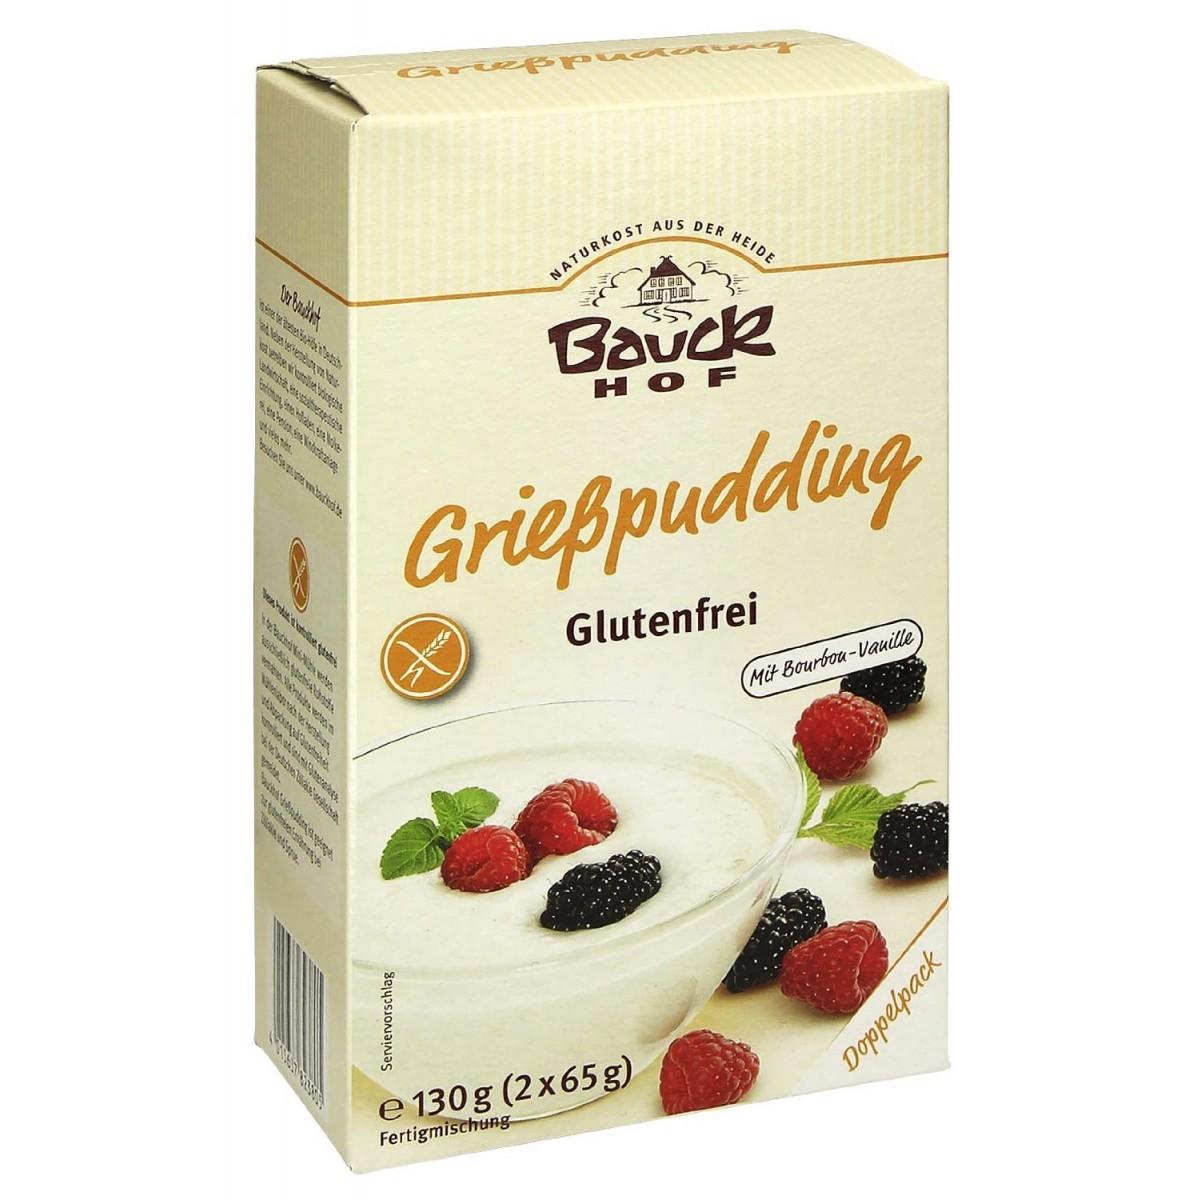 Griesmeelpudding